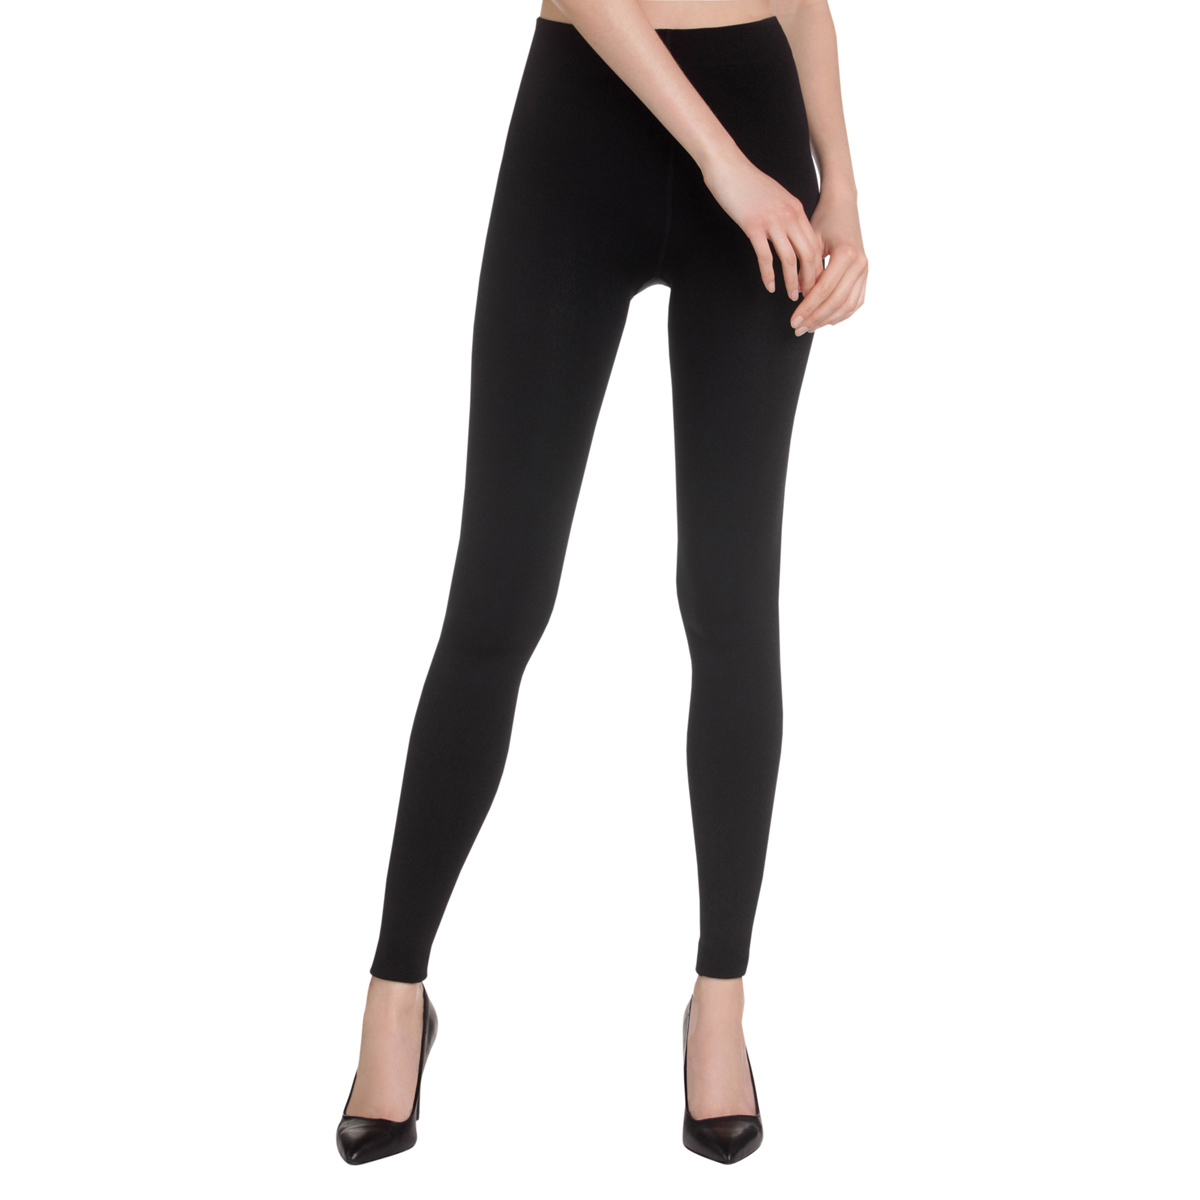 Legging chaud noir Thermo Polaire 143D